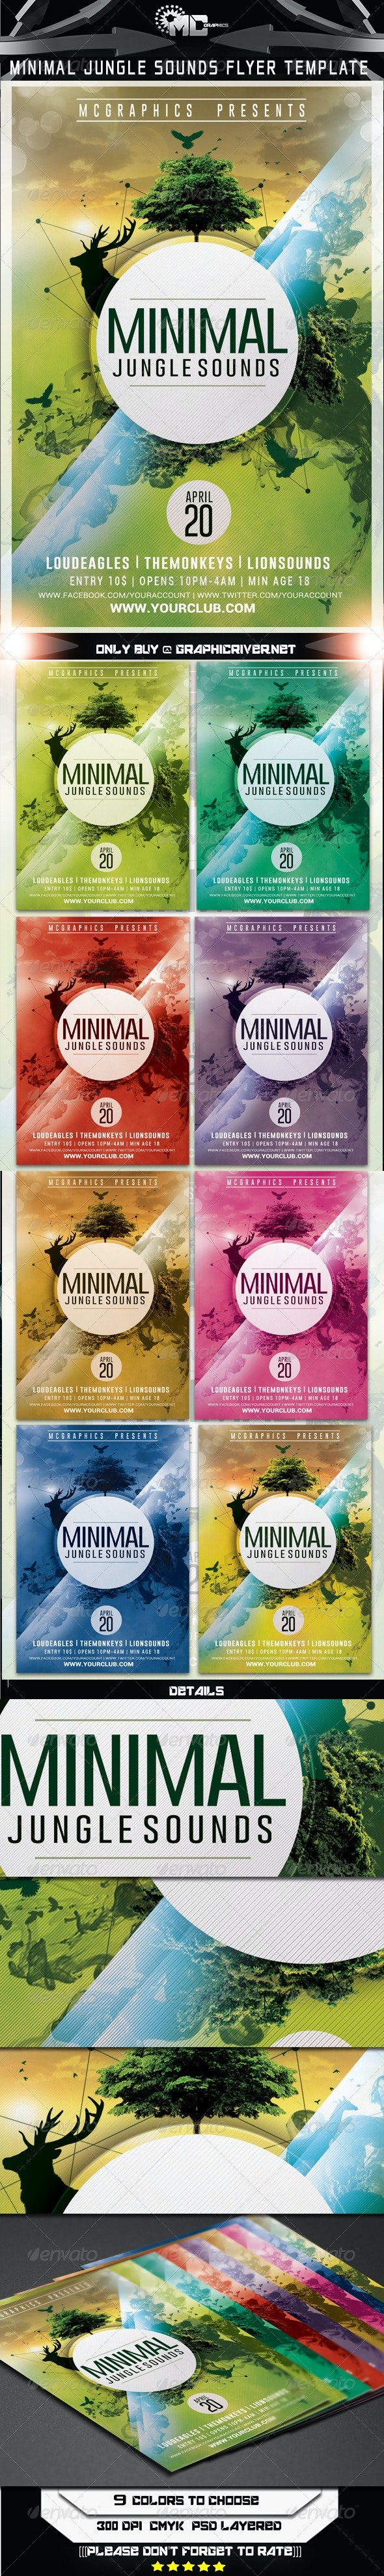 Minimal Jungle Sounds Flyer Template - Flyers Print Templates